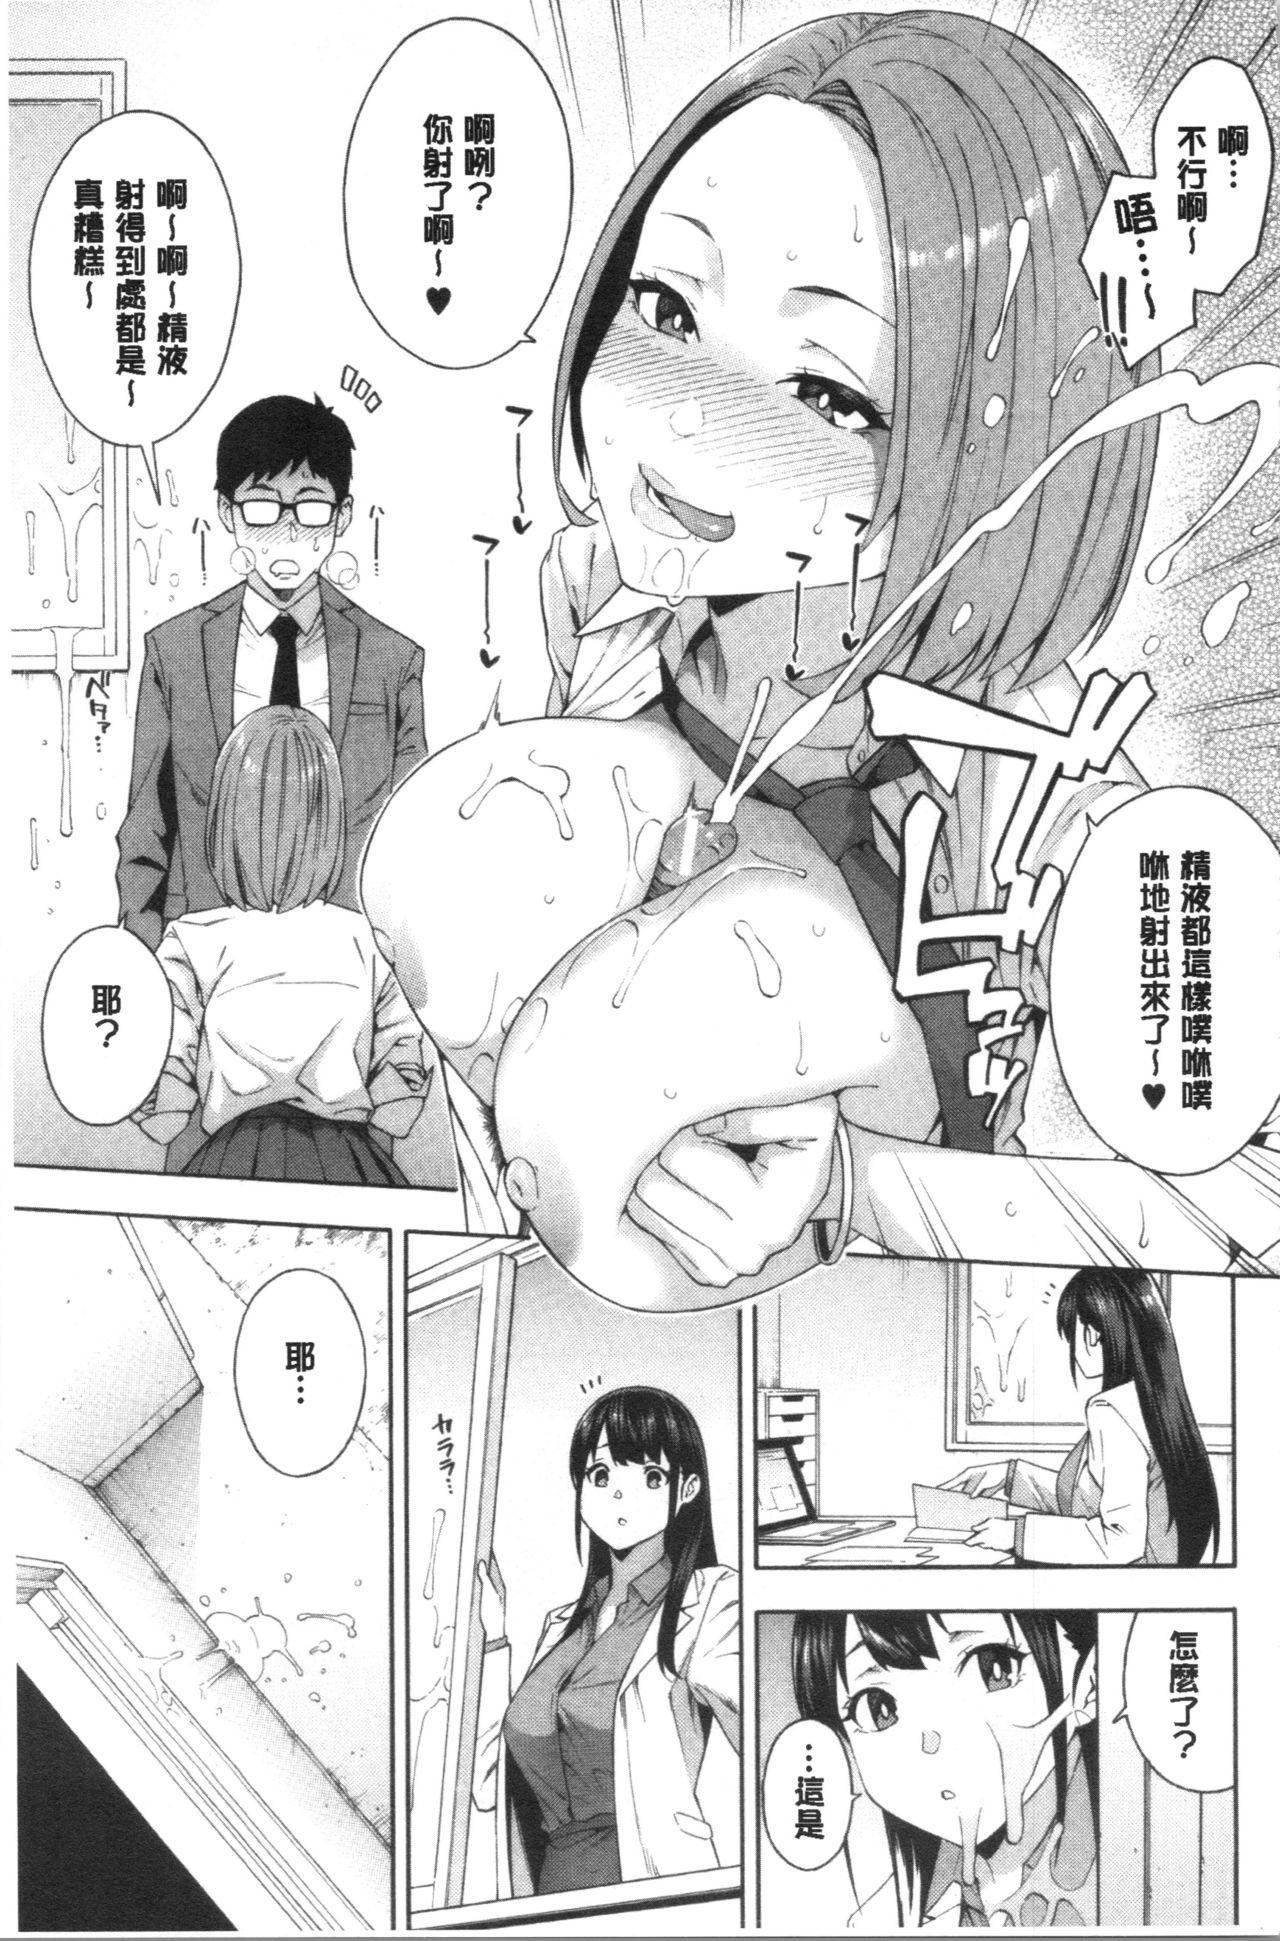 Okashite Ageru | 讓你來侵犯我 25